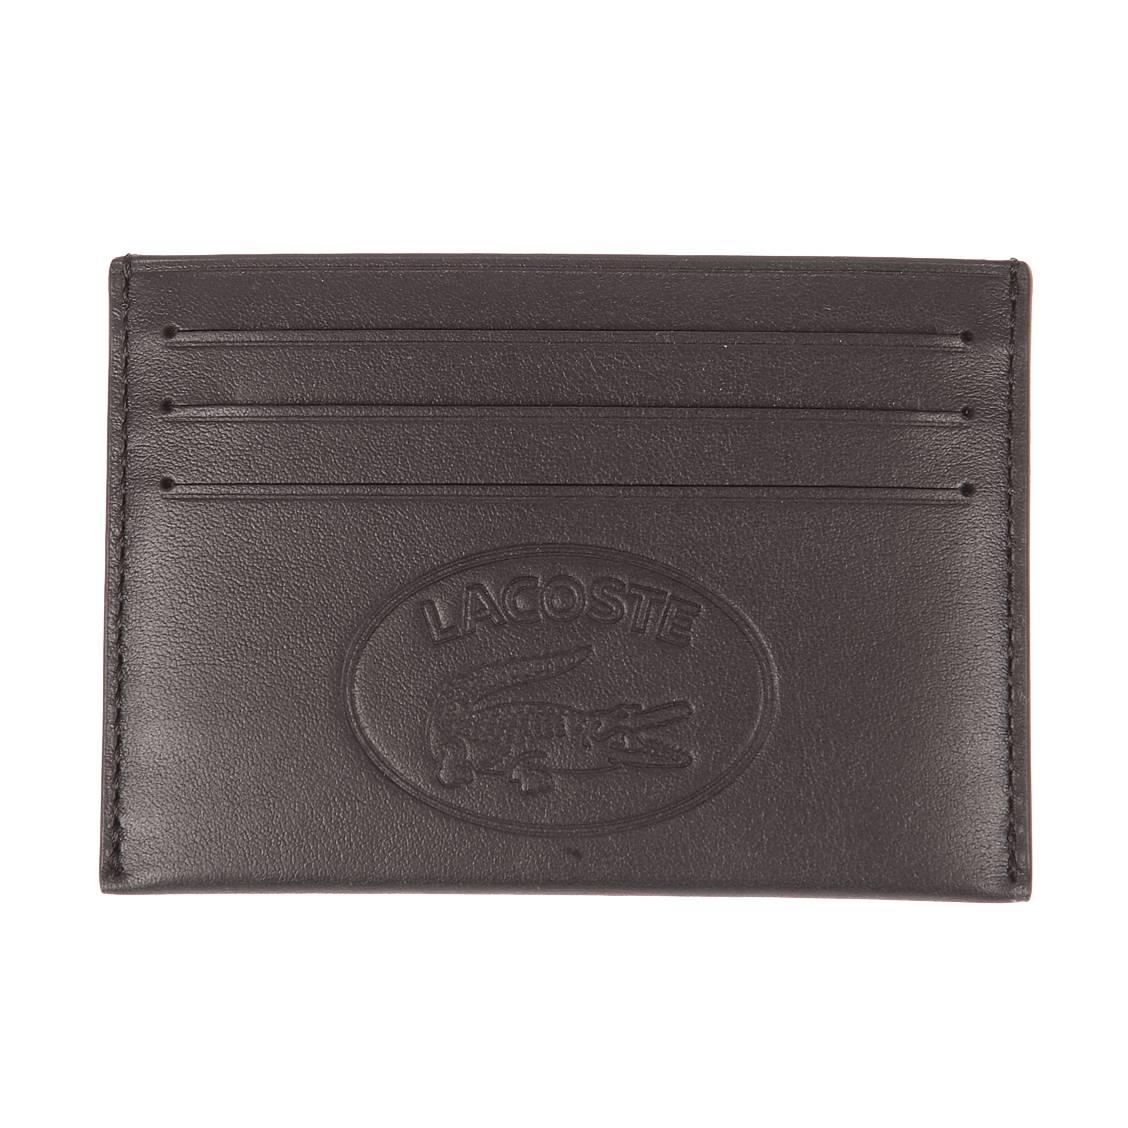 Porte-cartes italien  cuir casual en cuir de vache noir avec logo embossé